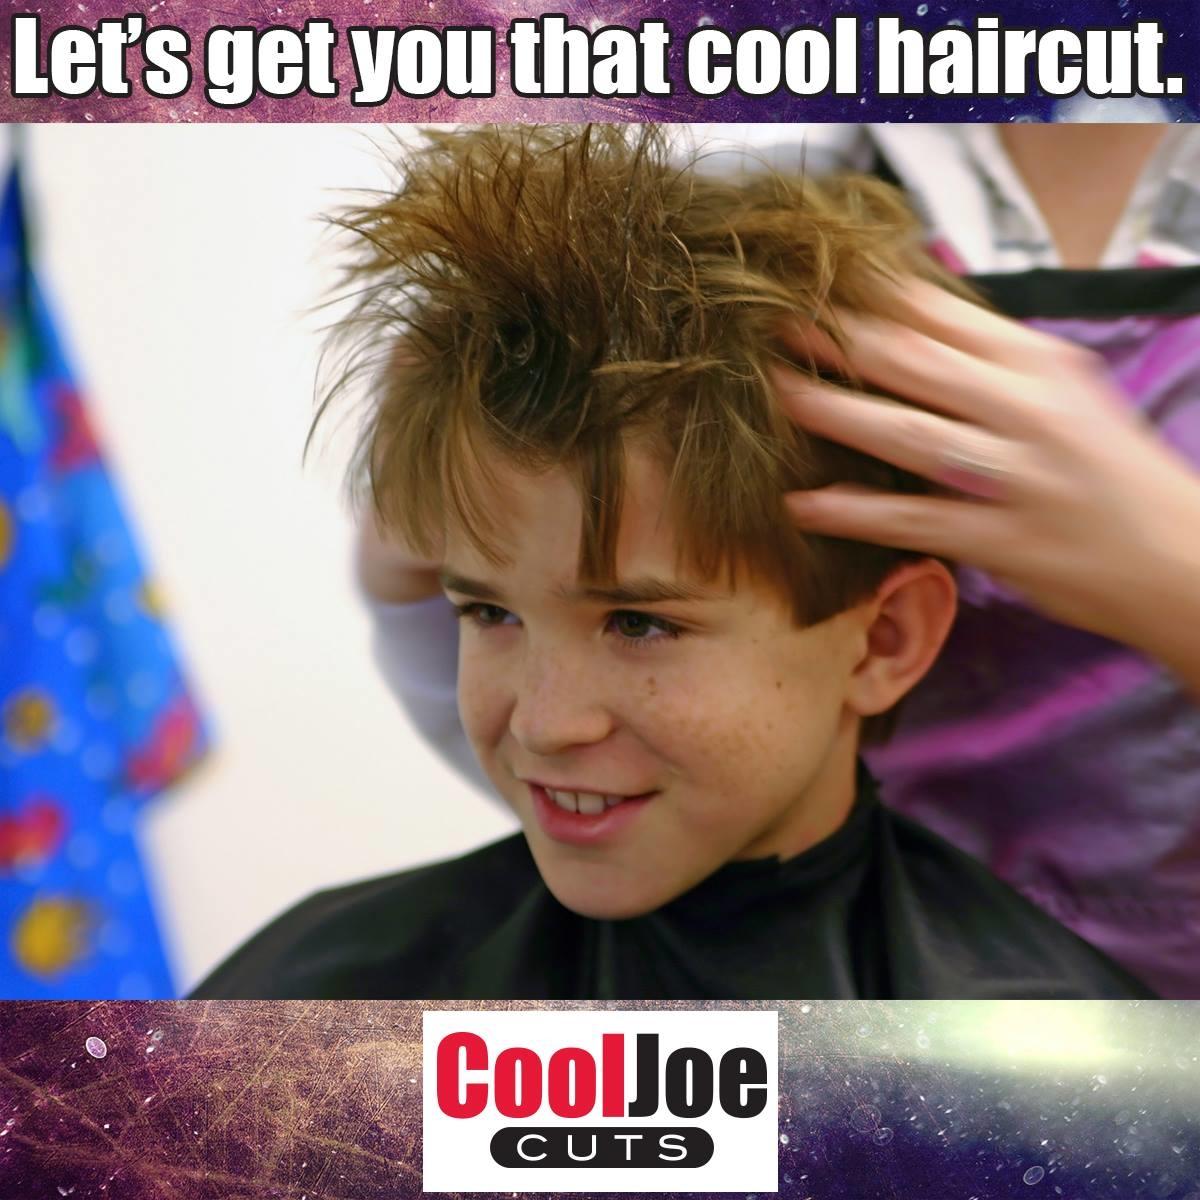 Cool Joe Cuts - Sean Haggerty image 4